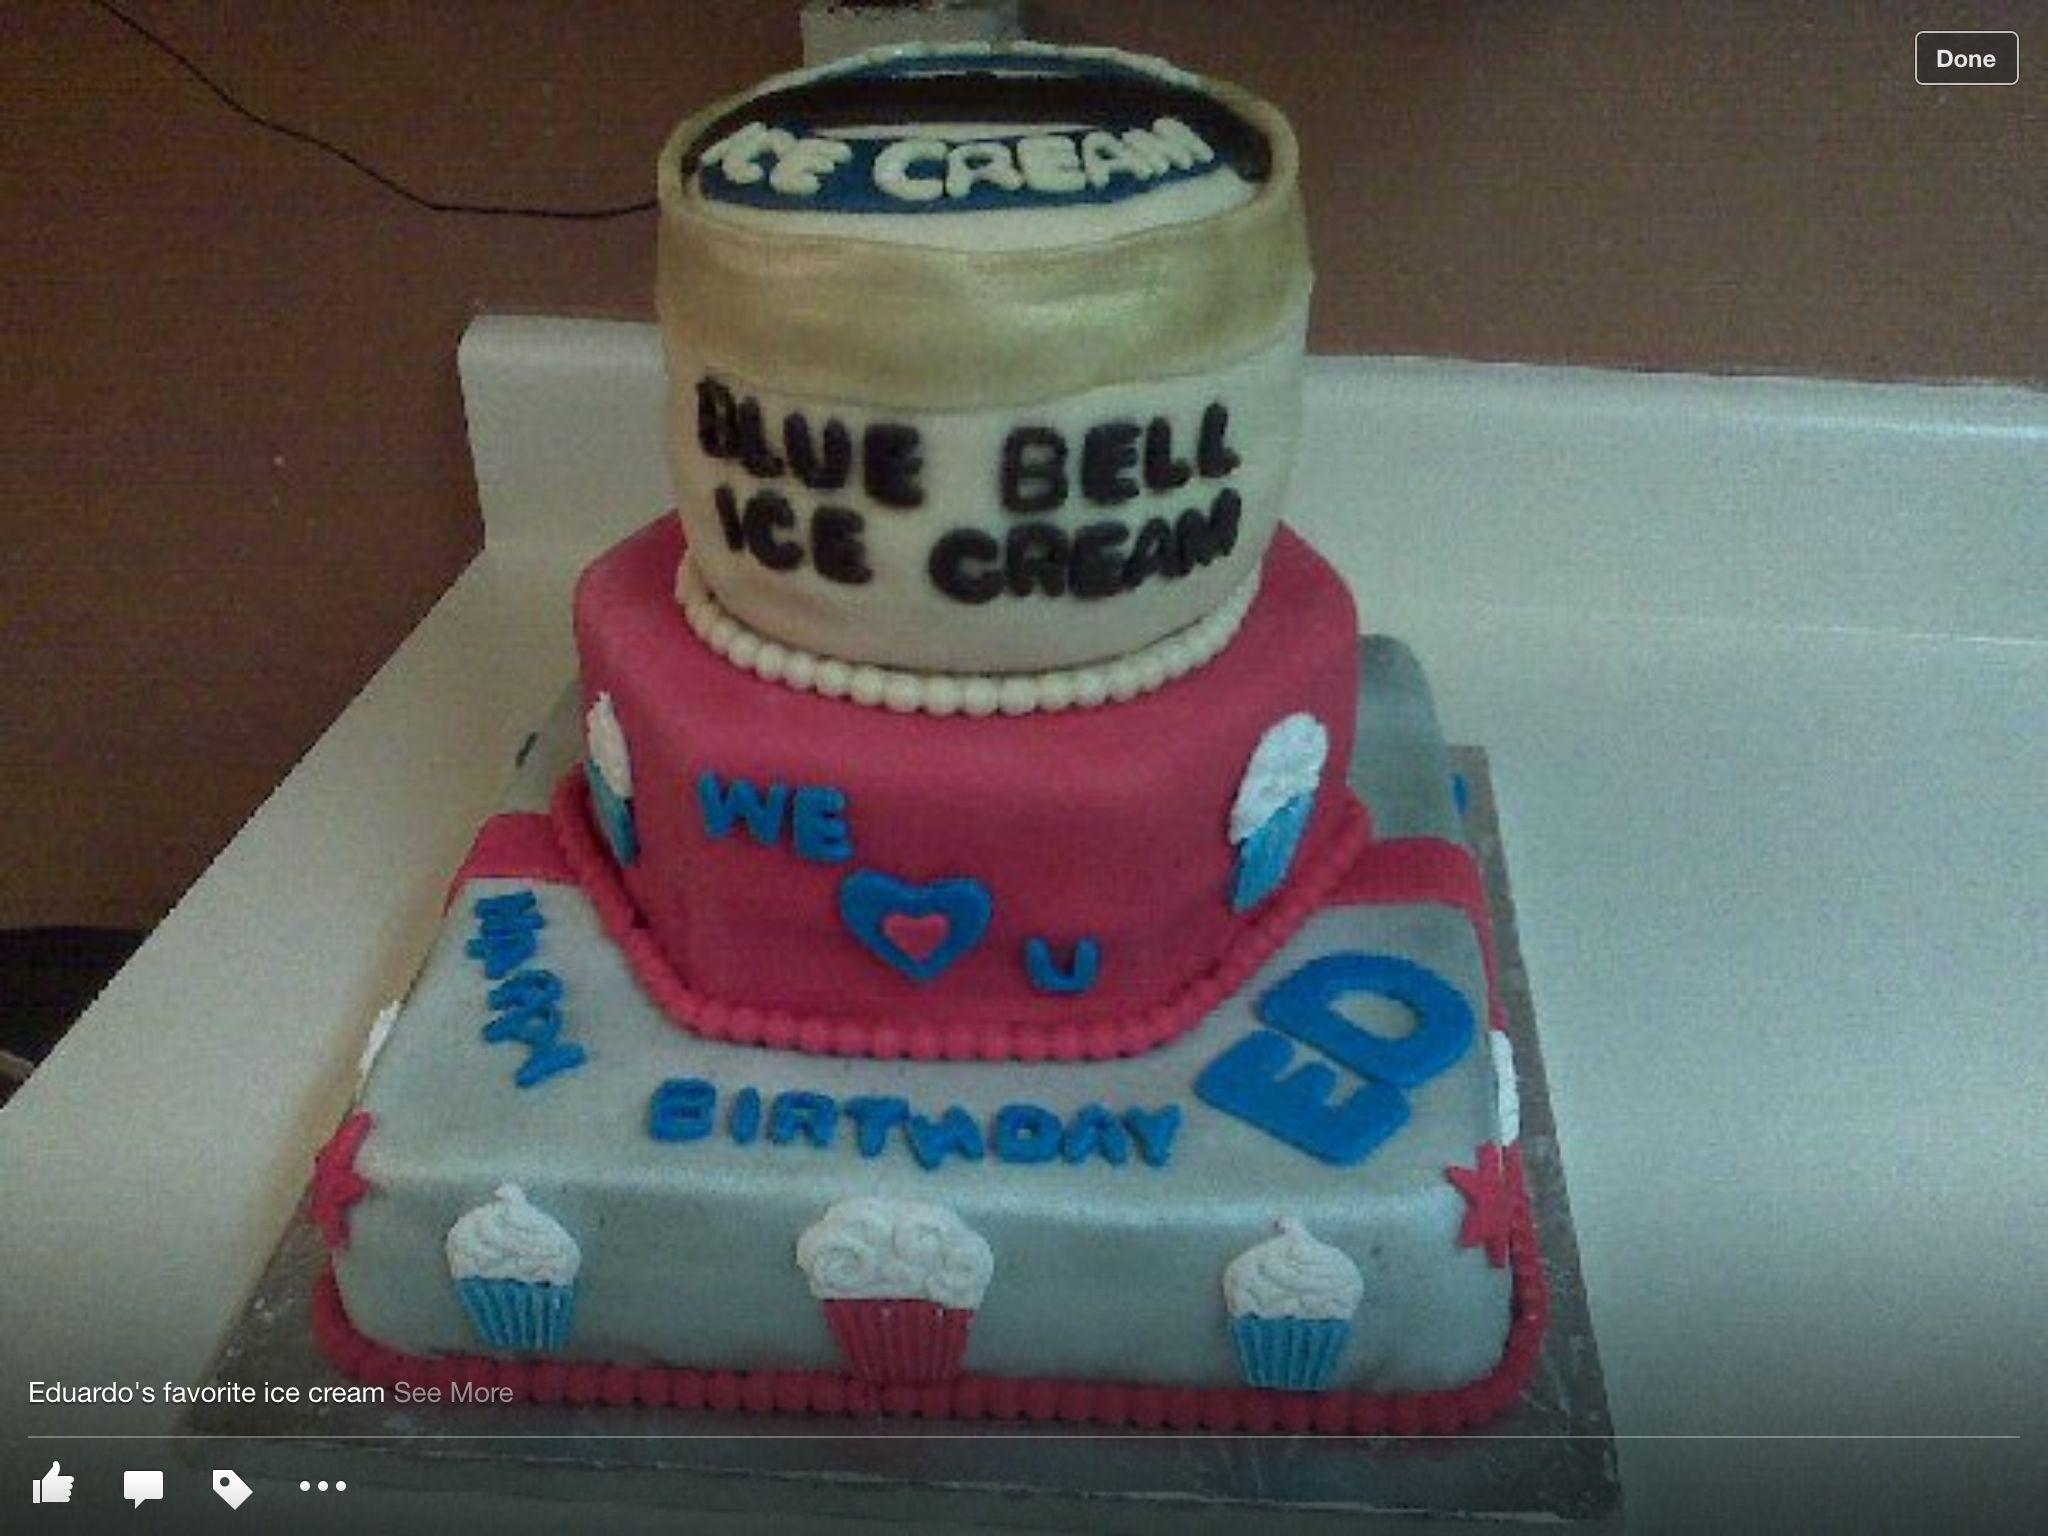 Blue bell ice cream birthday cake ice cream birthday